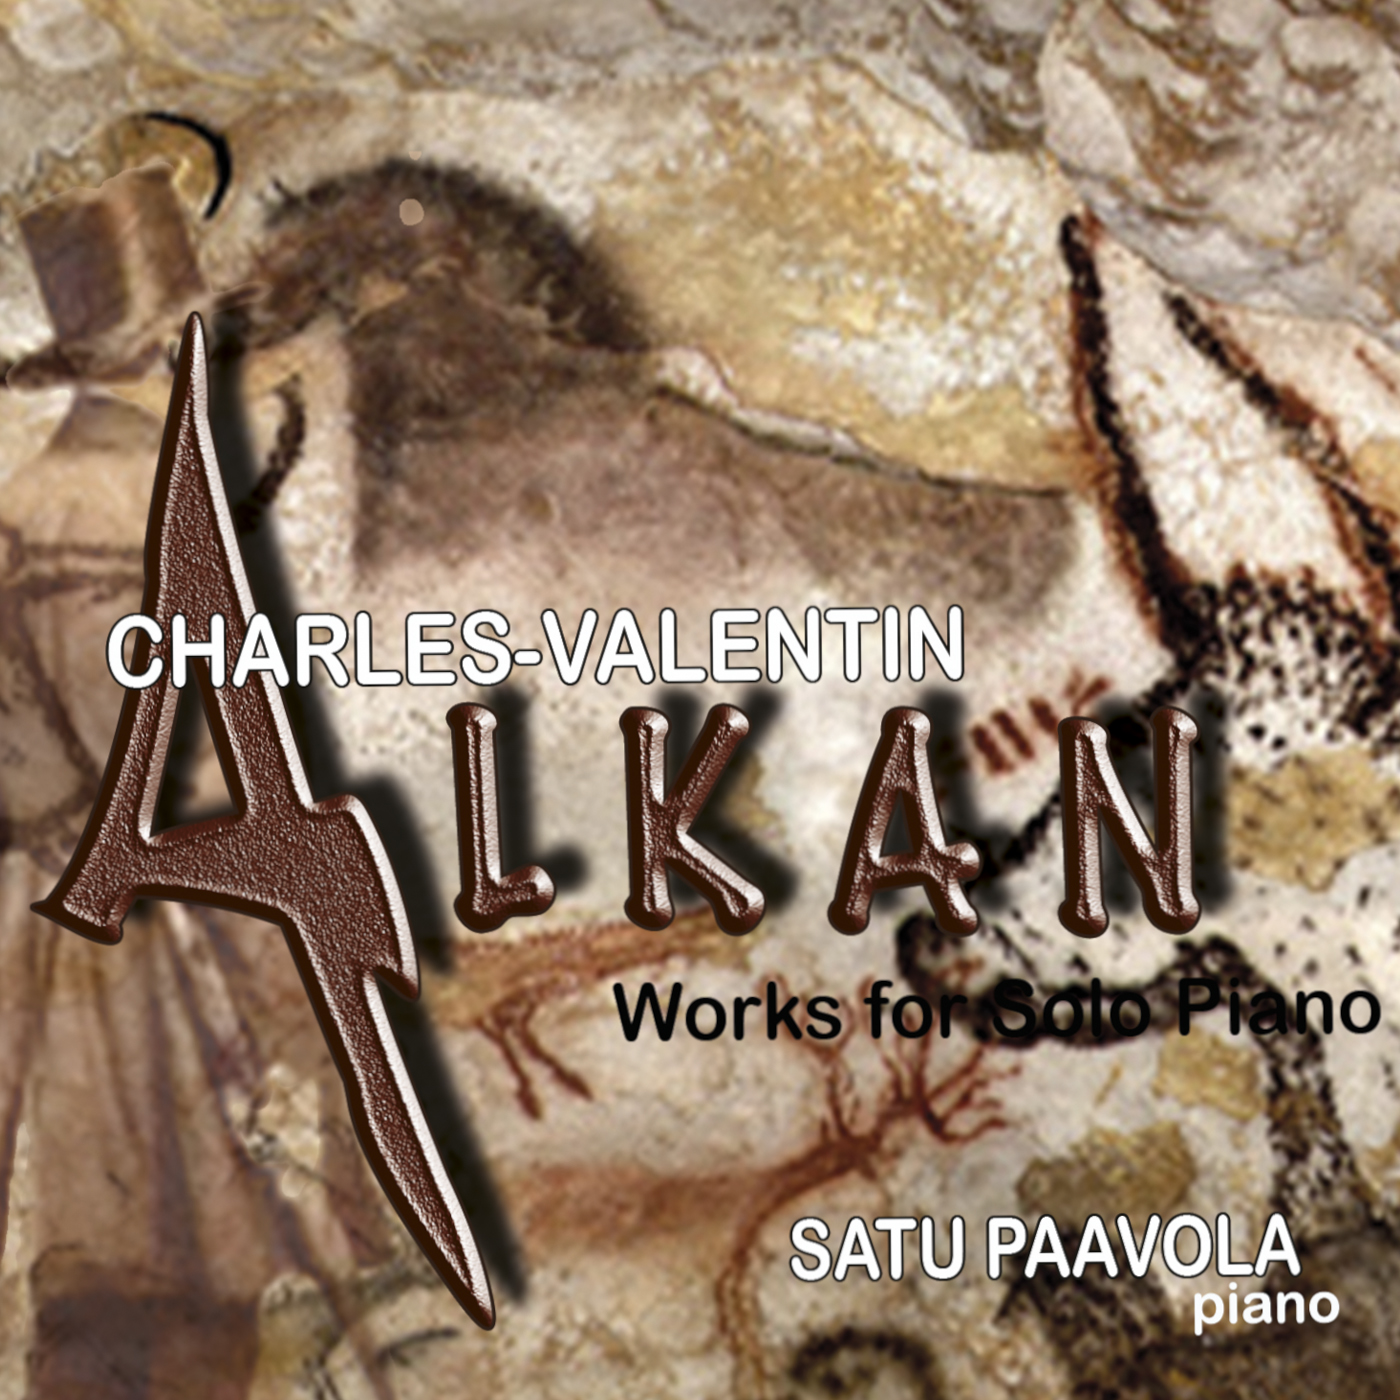 Satu Paavola: Charles-Valentin Alkan Works for Solo Piano